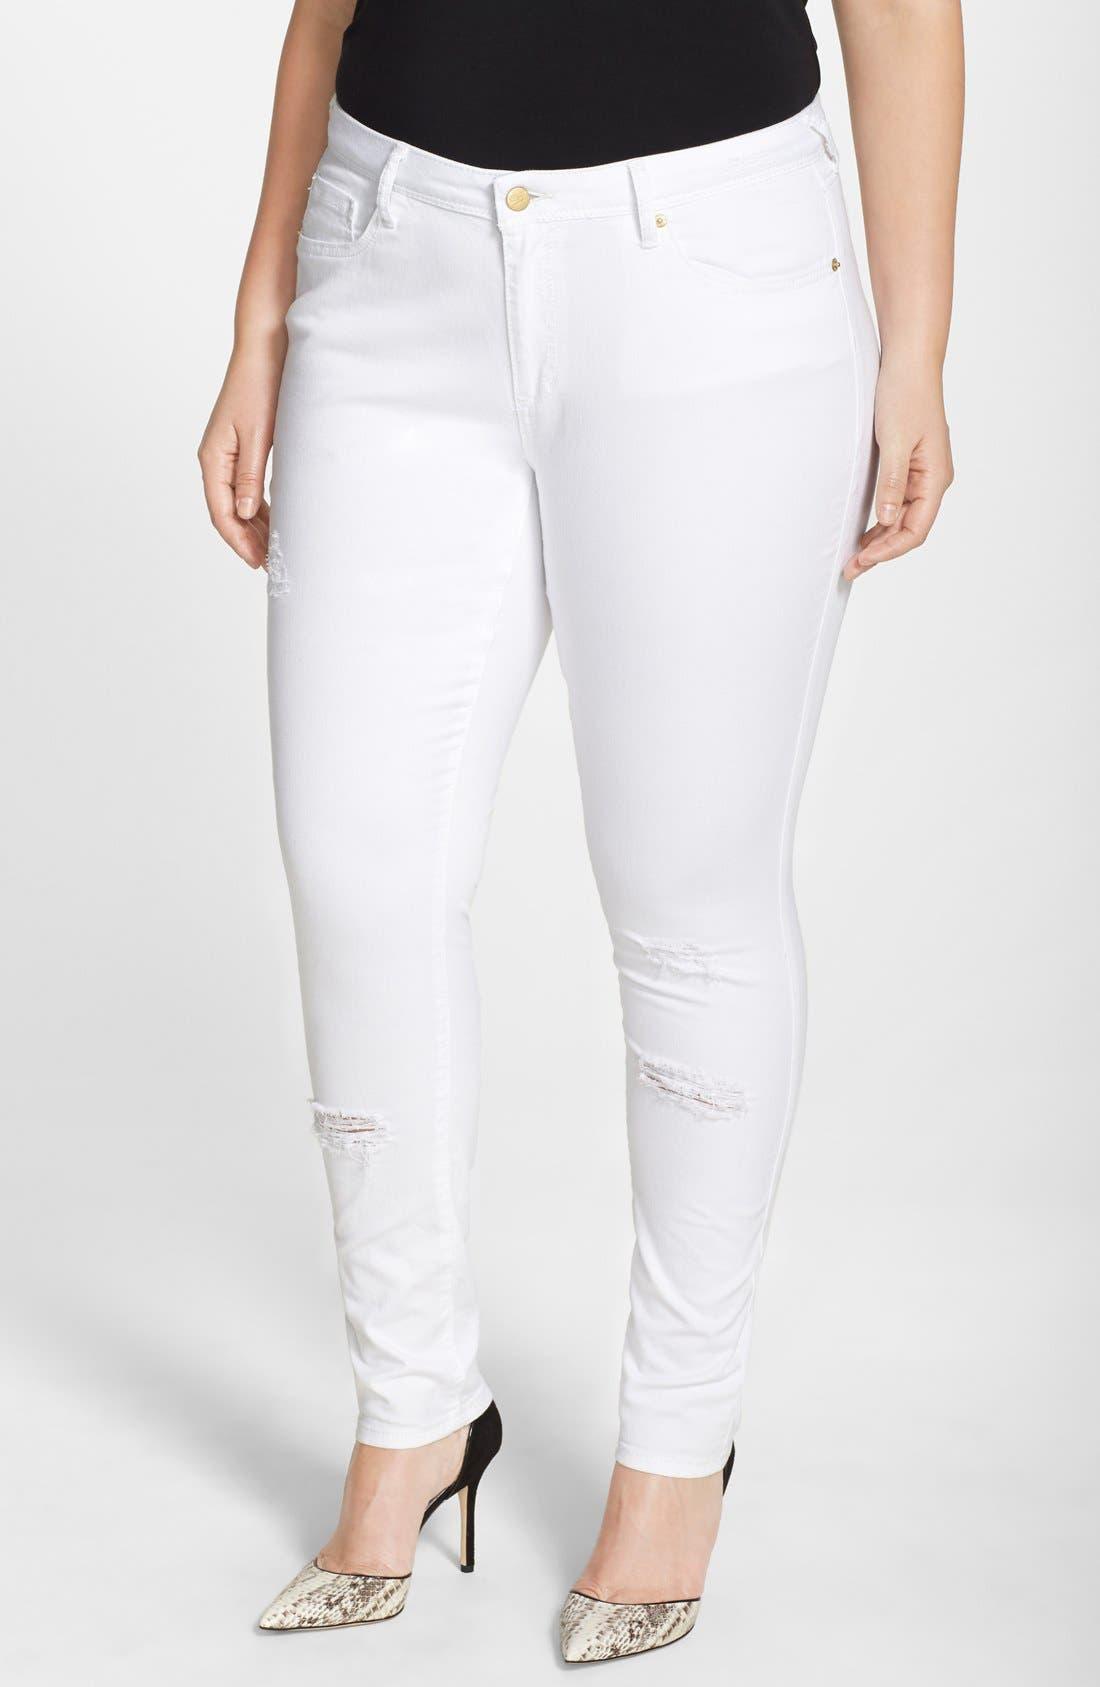 'Maya' Destroyed White Skinny Jeans,                             Main thumbnail 1, color,                             CASPER